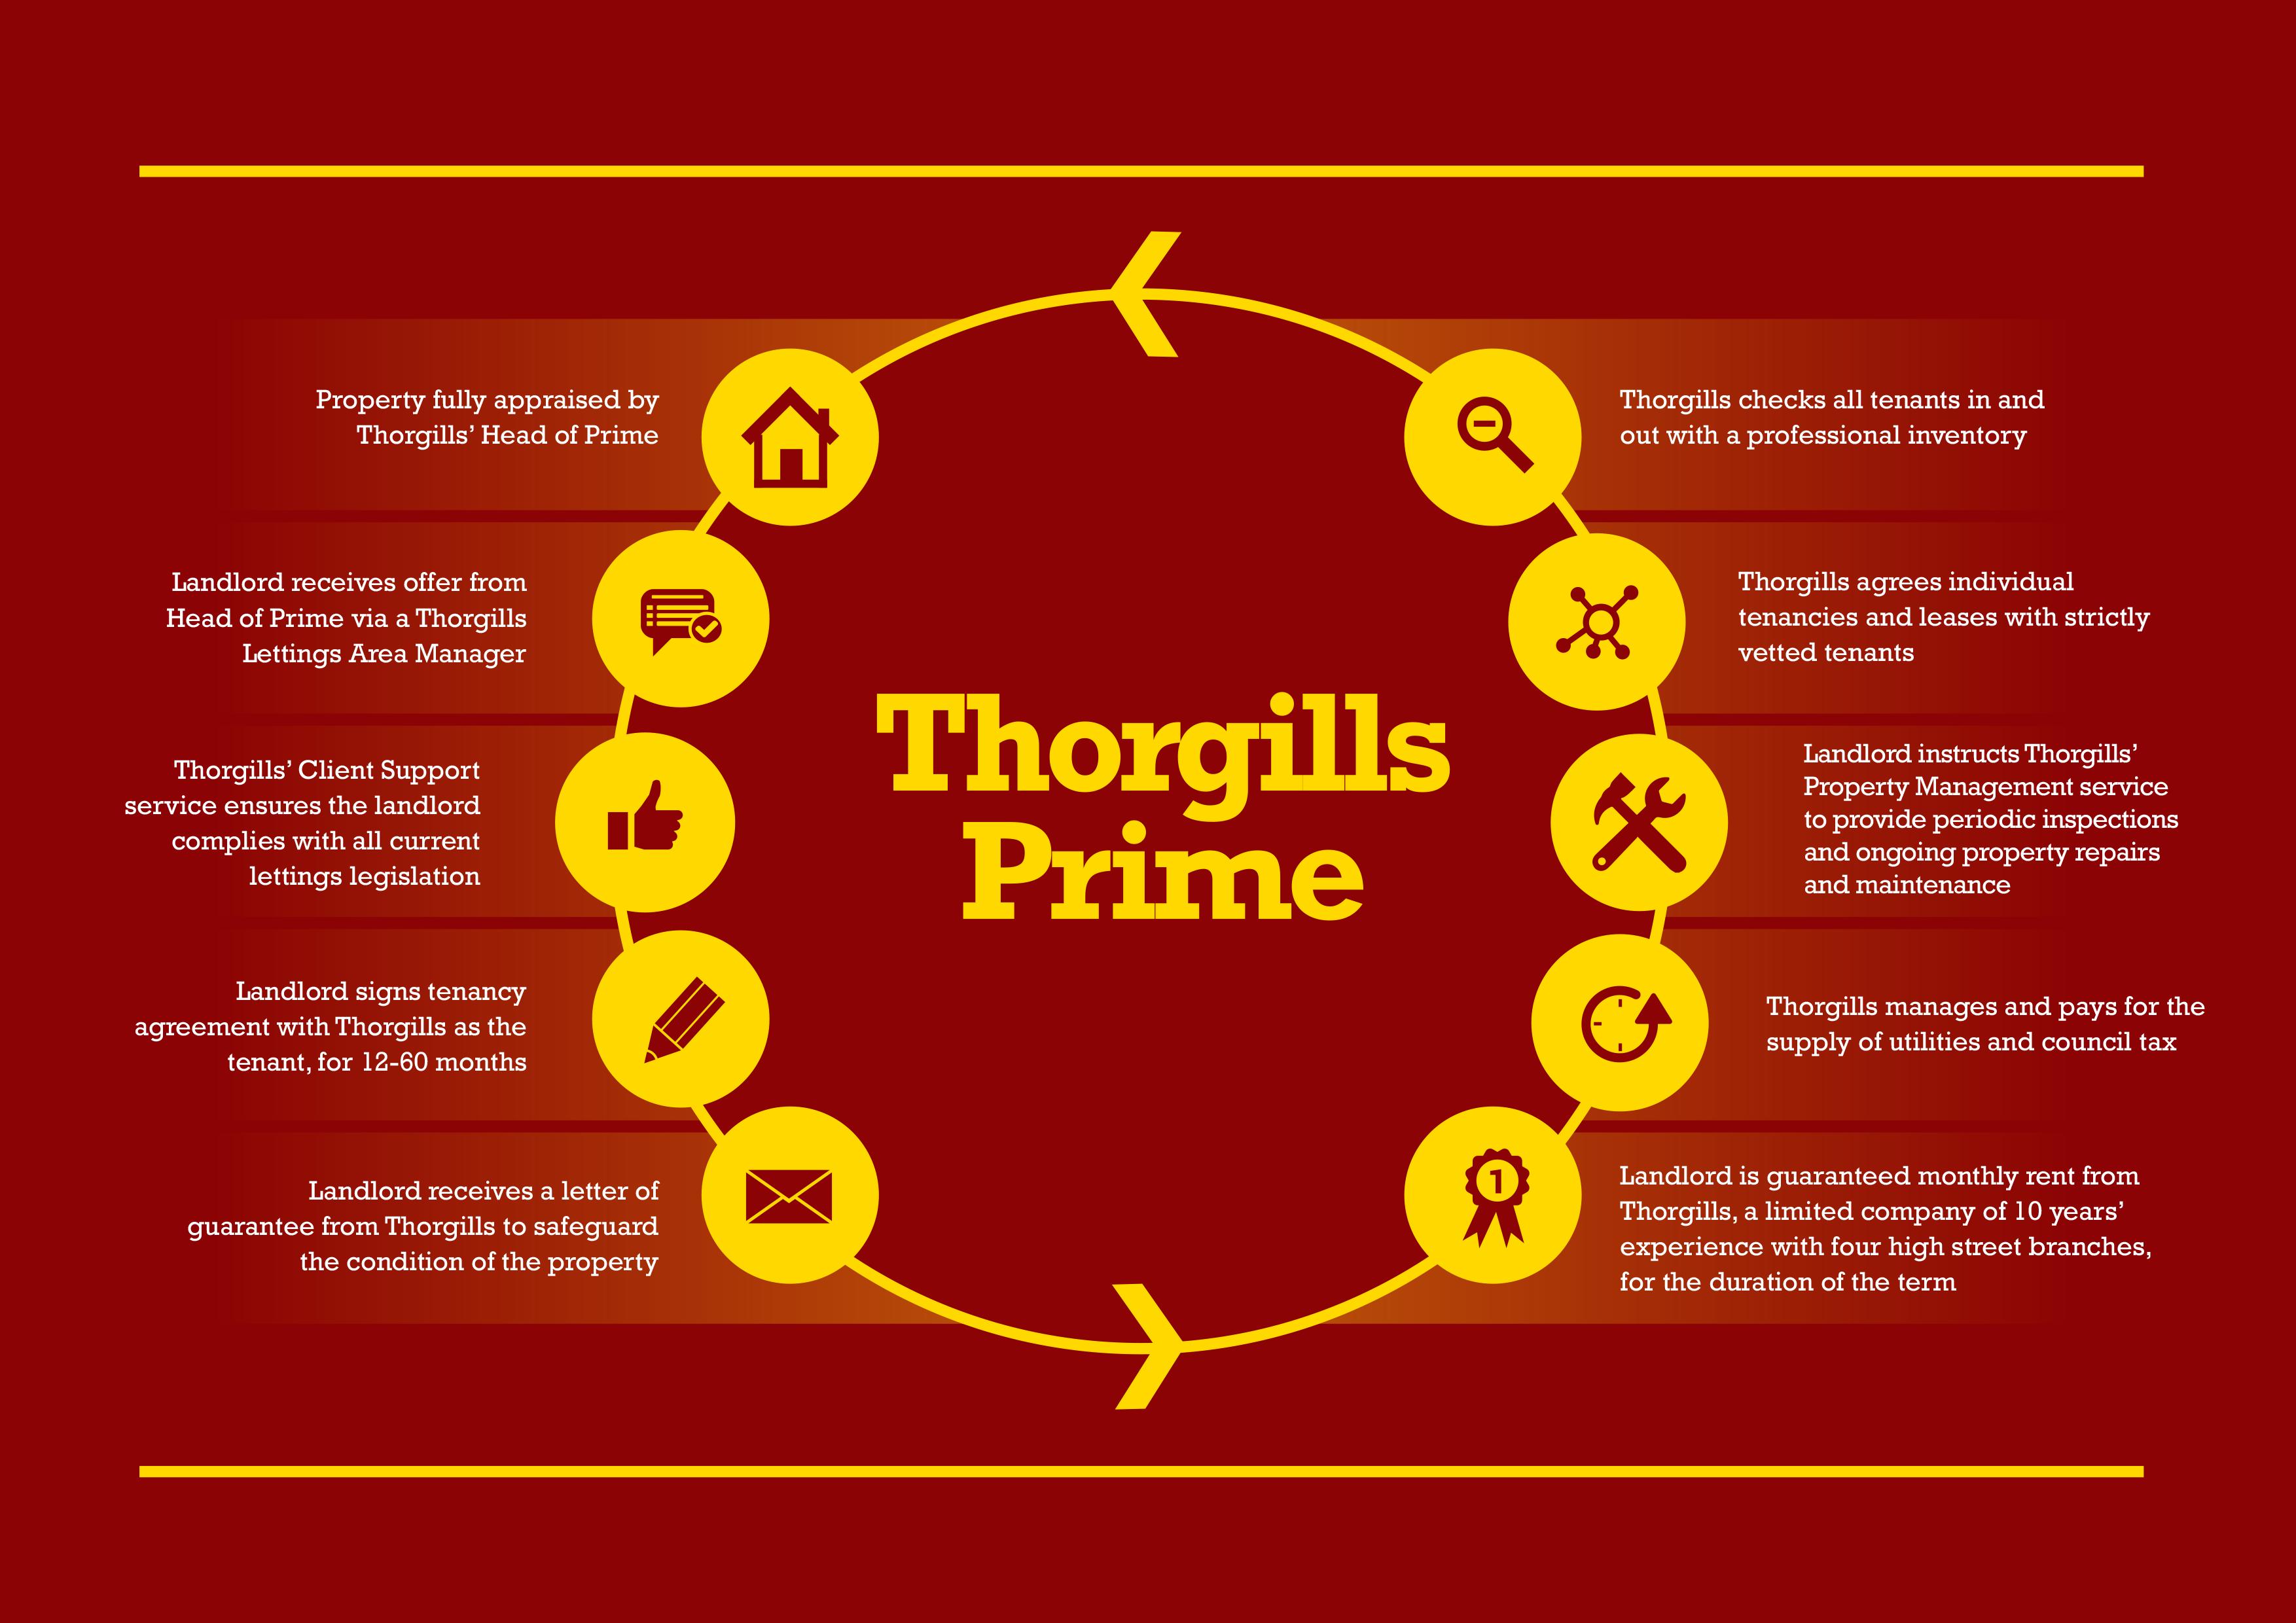 Thorgills Prime